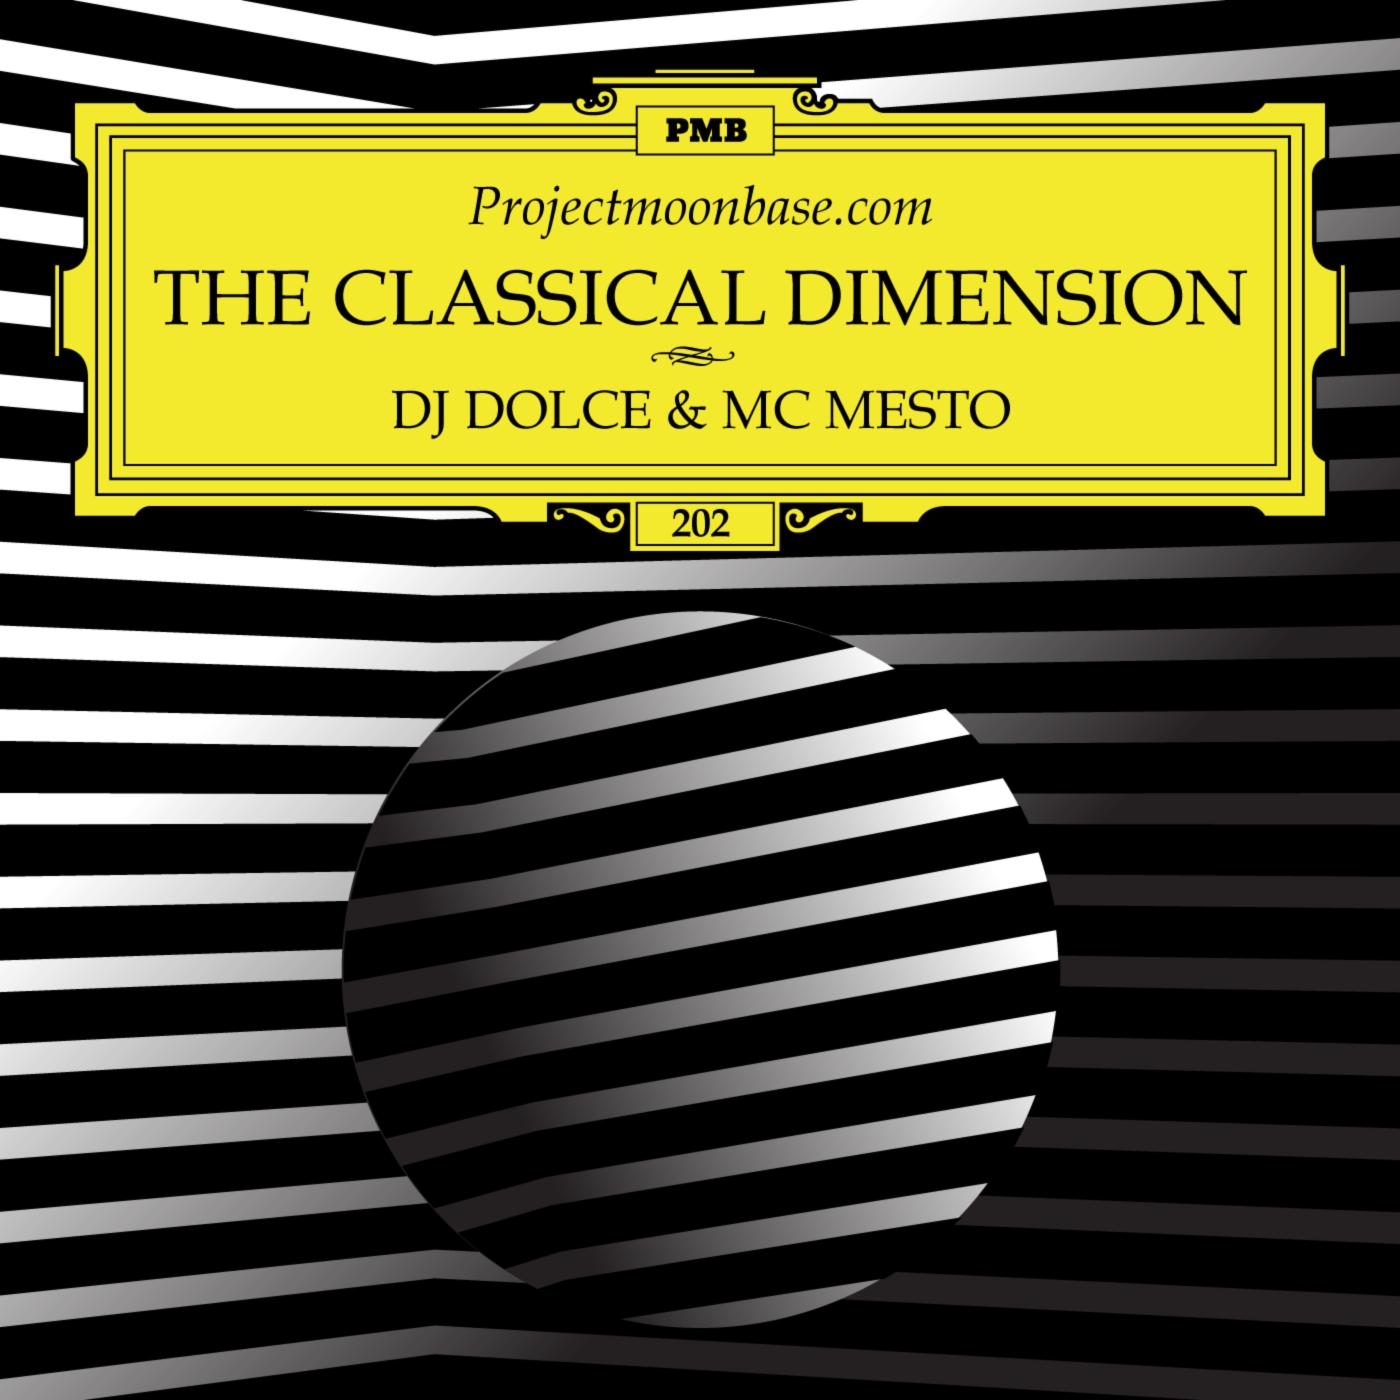 PMB202: The Classical Dimension